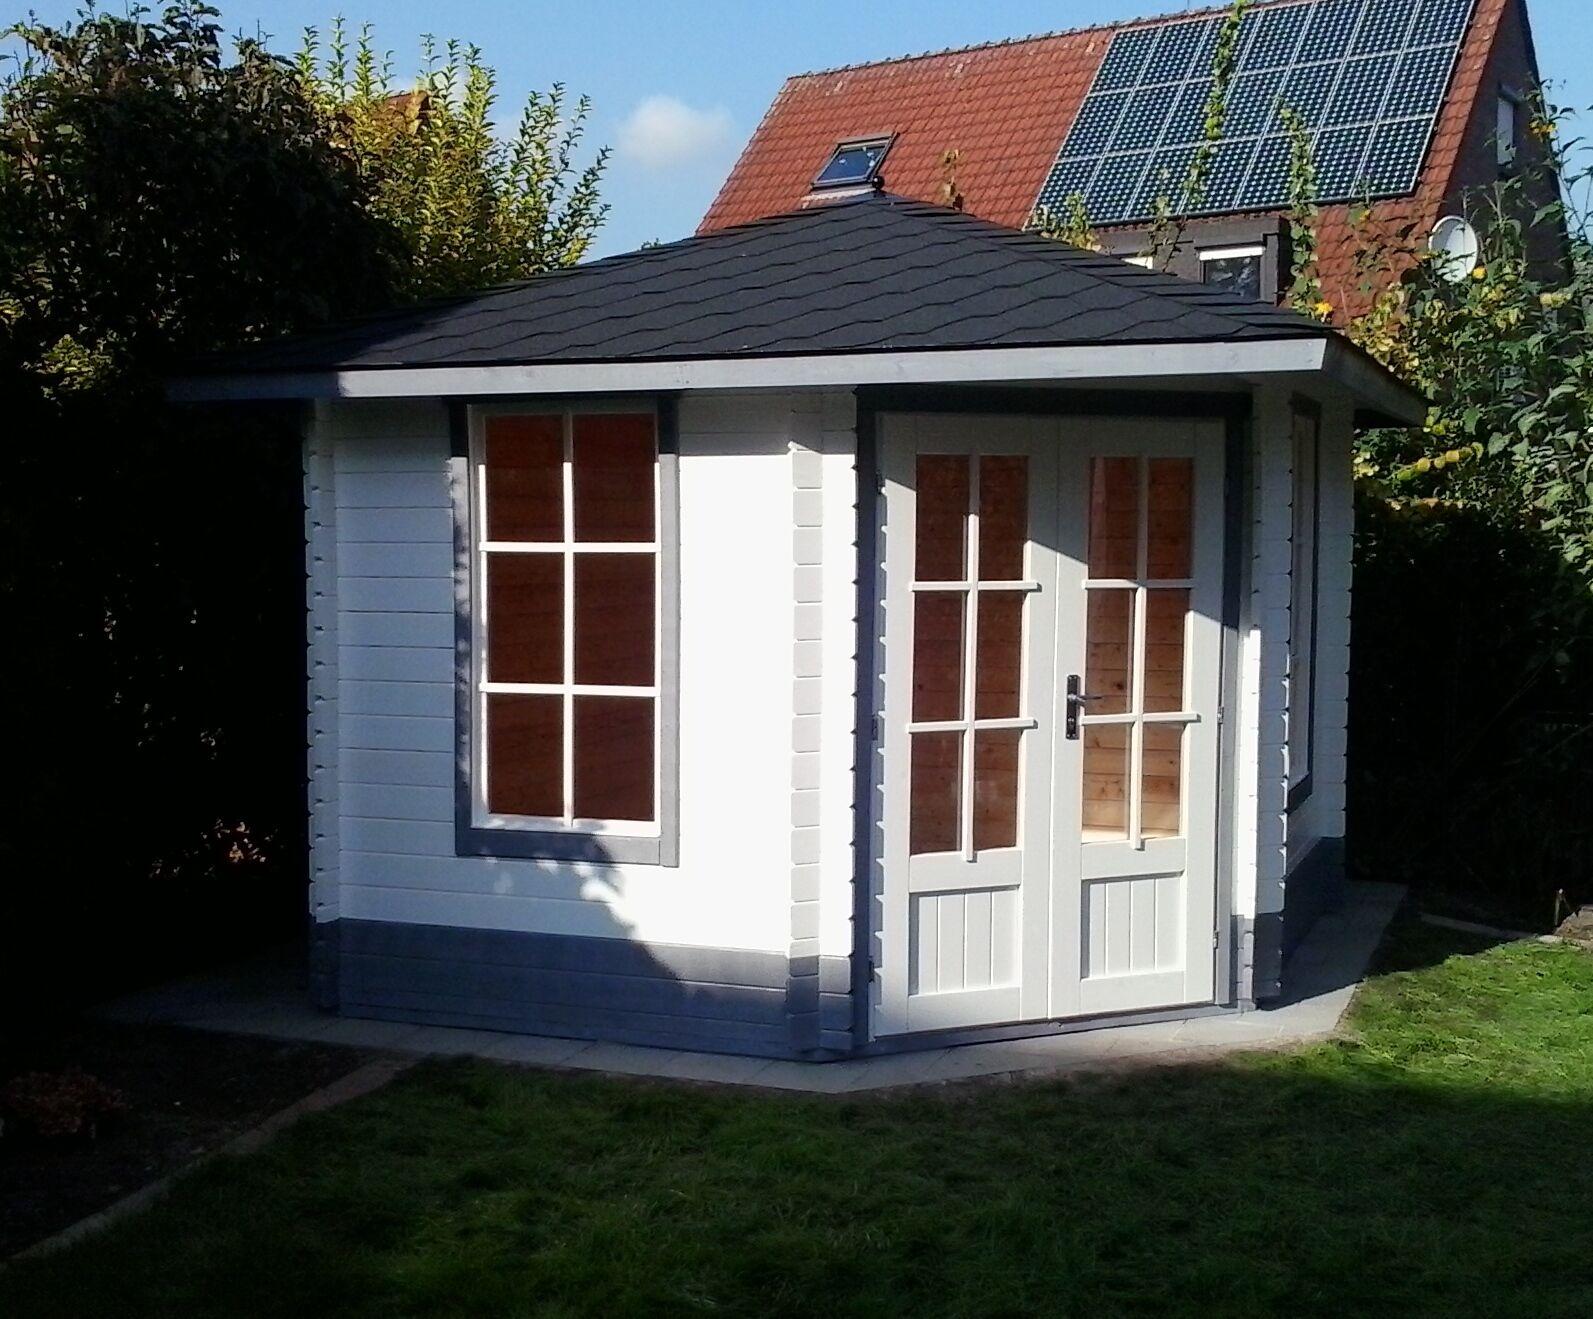 5 eck gartenhaus blockhaus, 3x3m 5-eckige aus holz